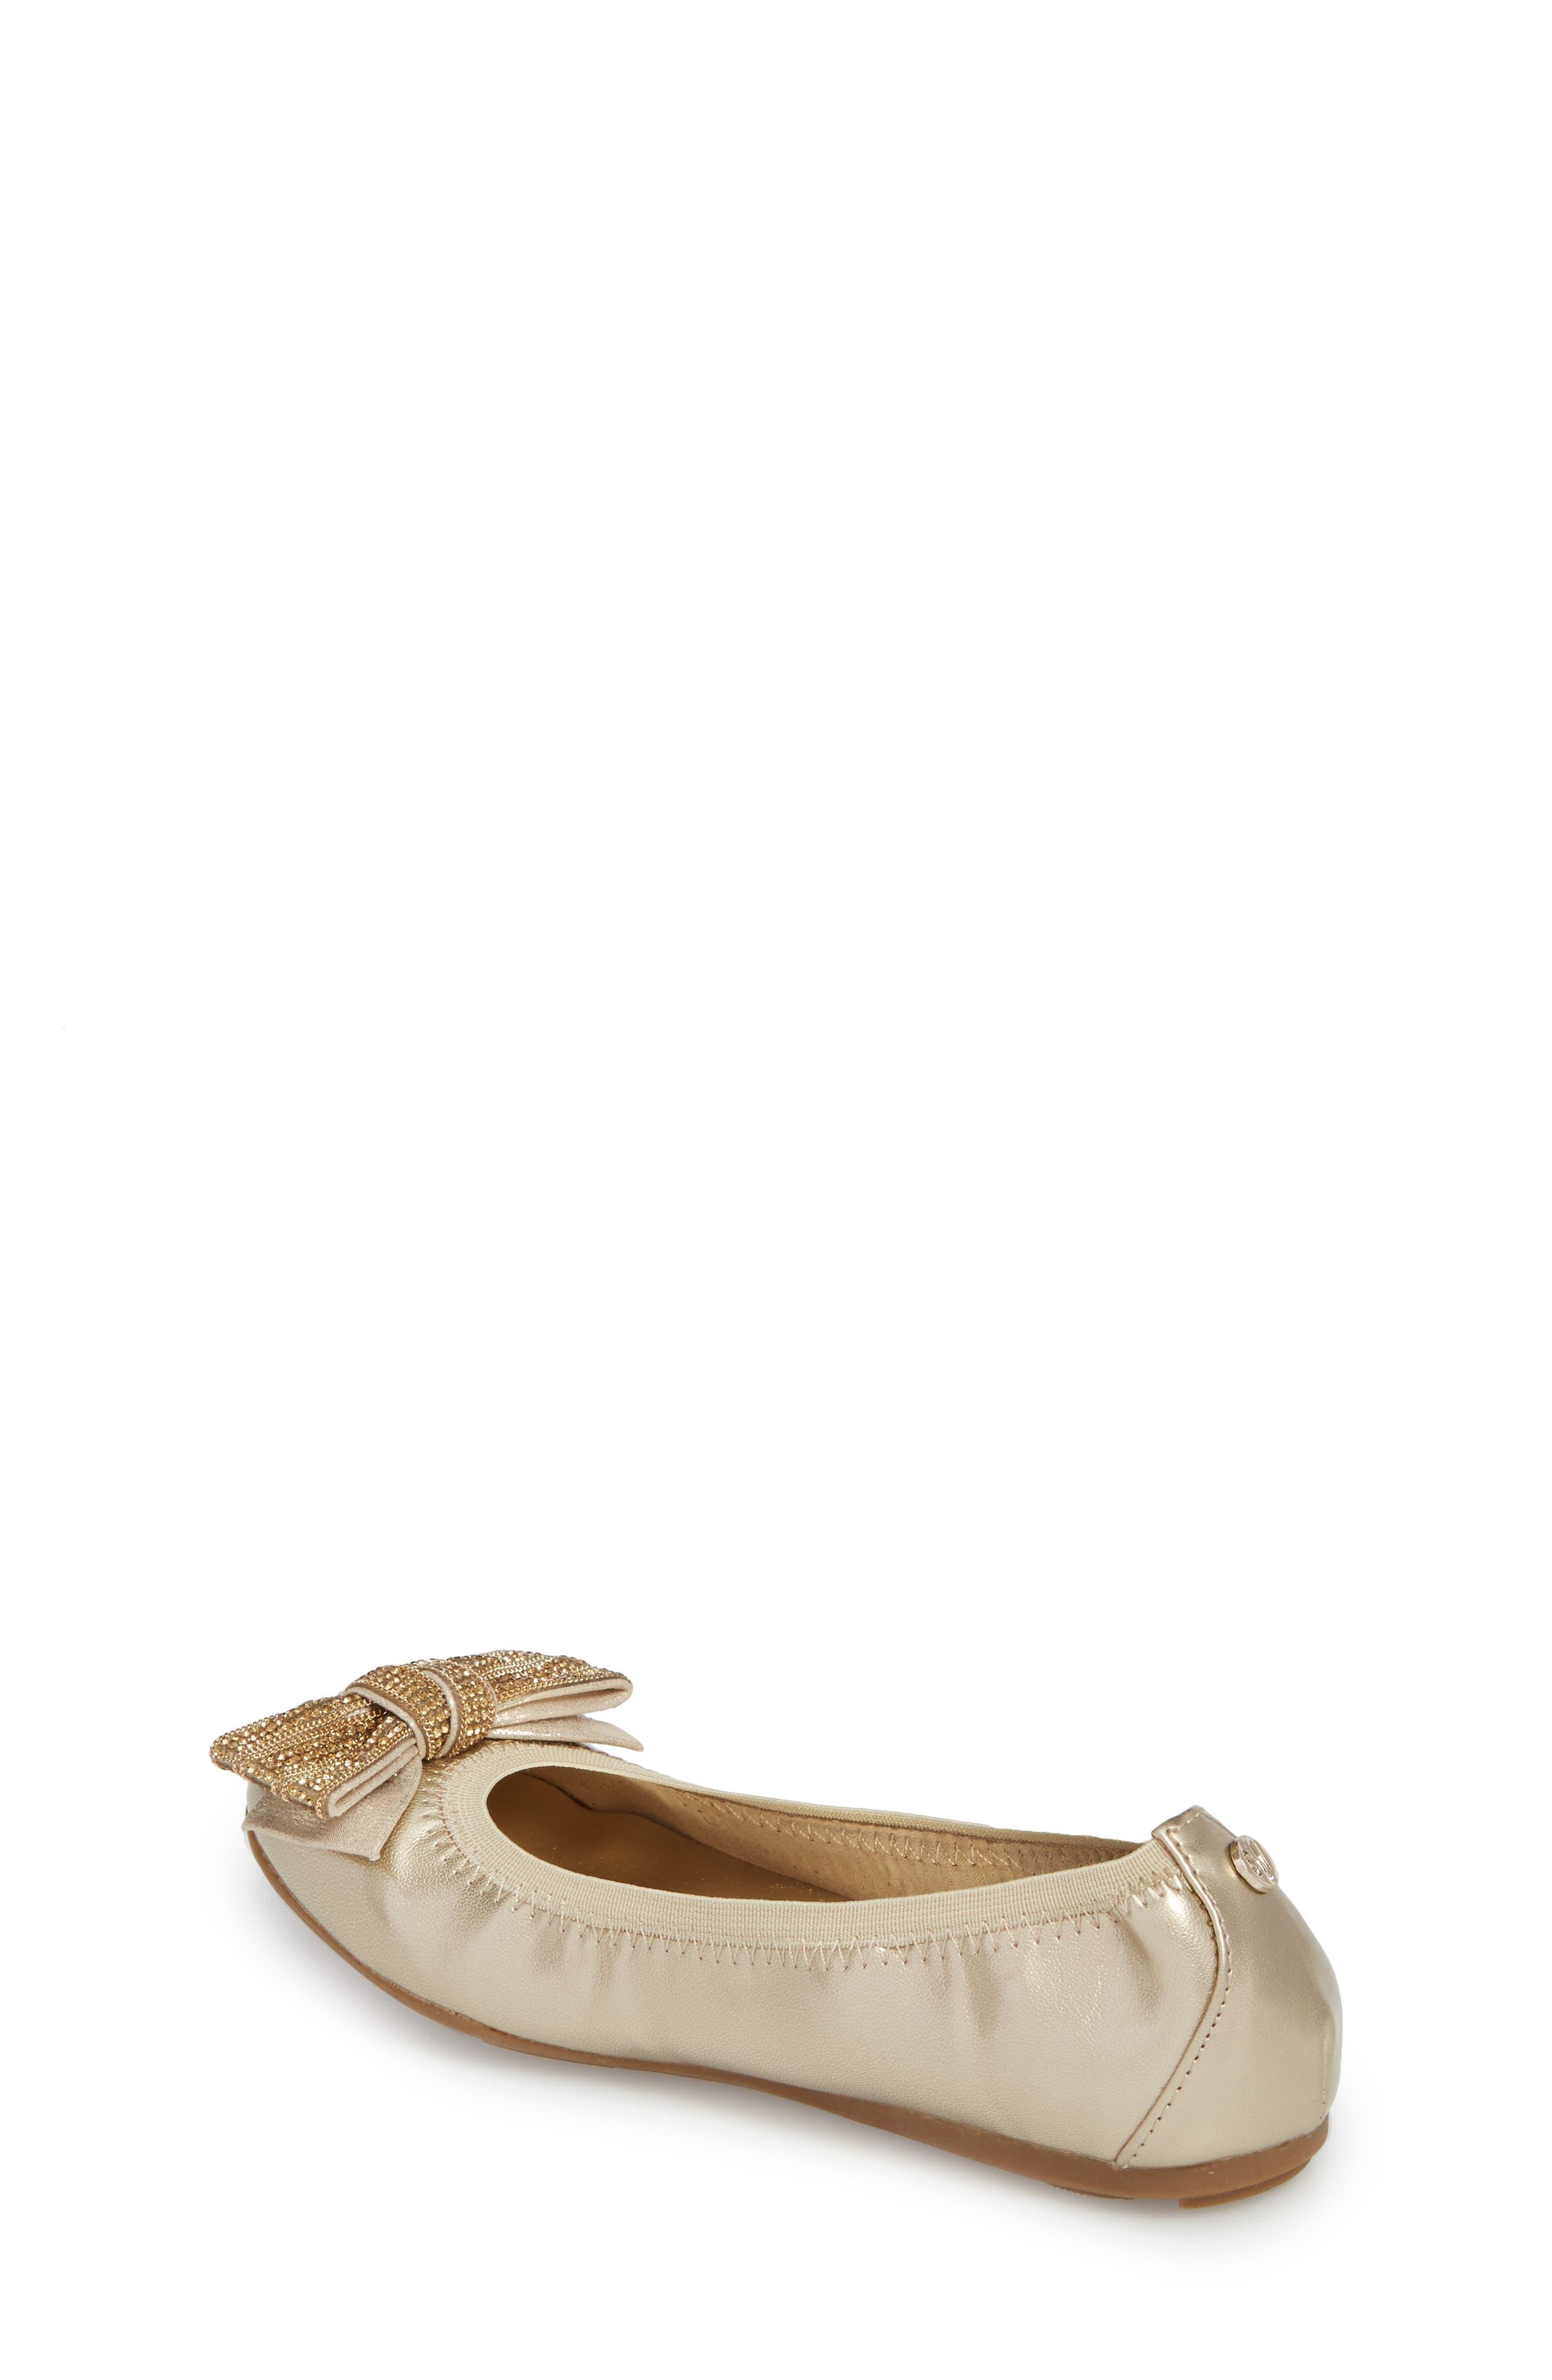 Fannie Embellished Bow Ballet Flat,                             Alternate thumbnail 6, color,